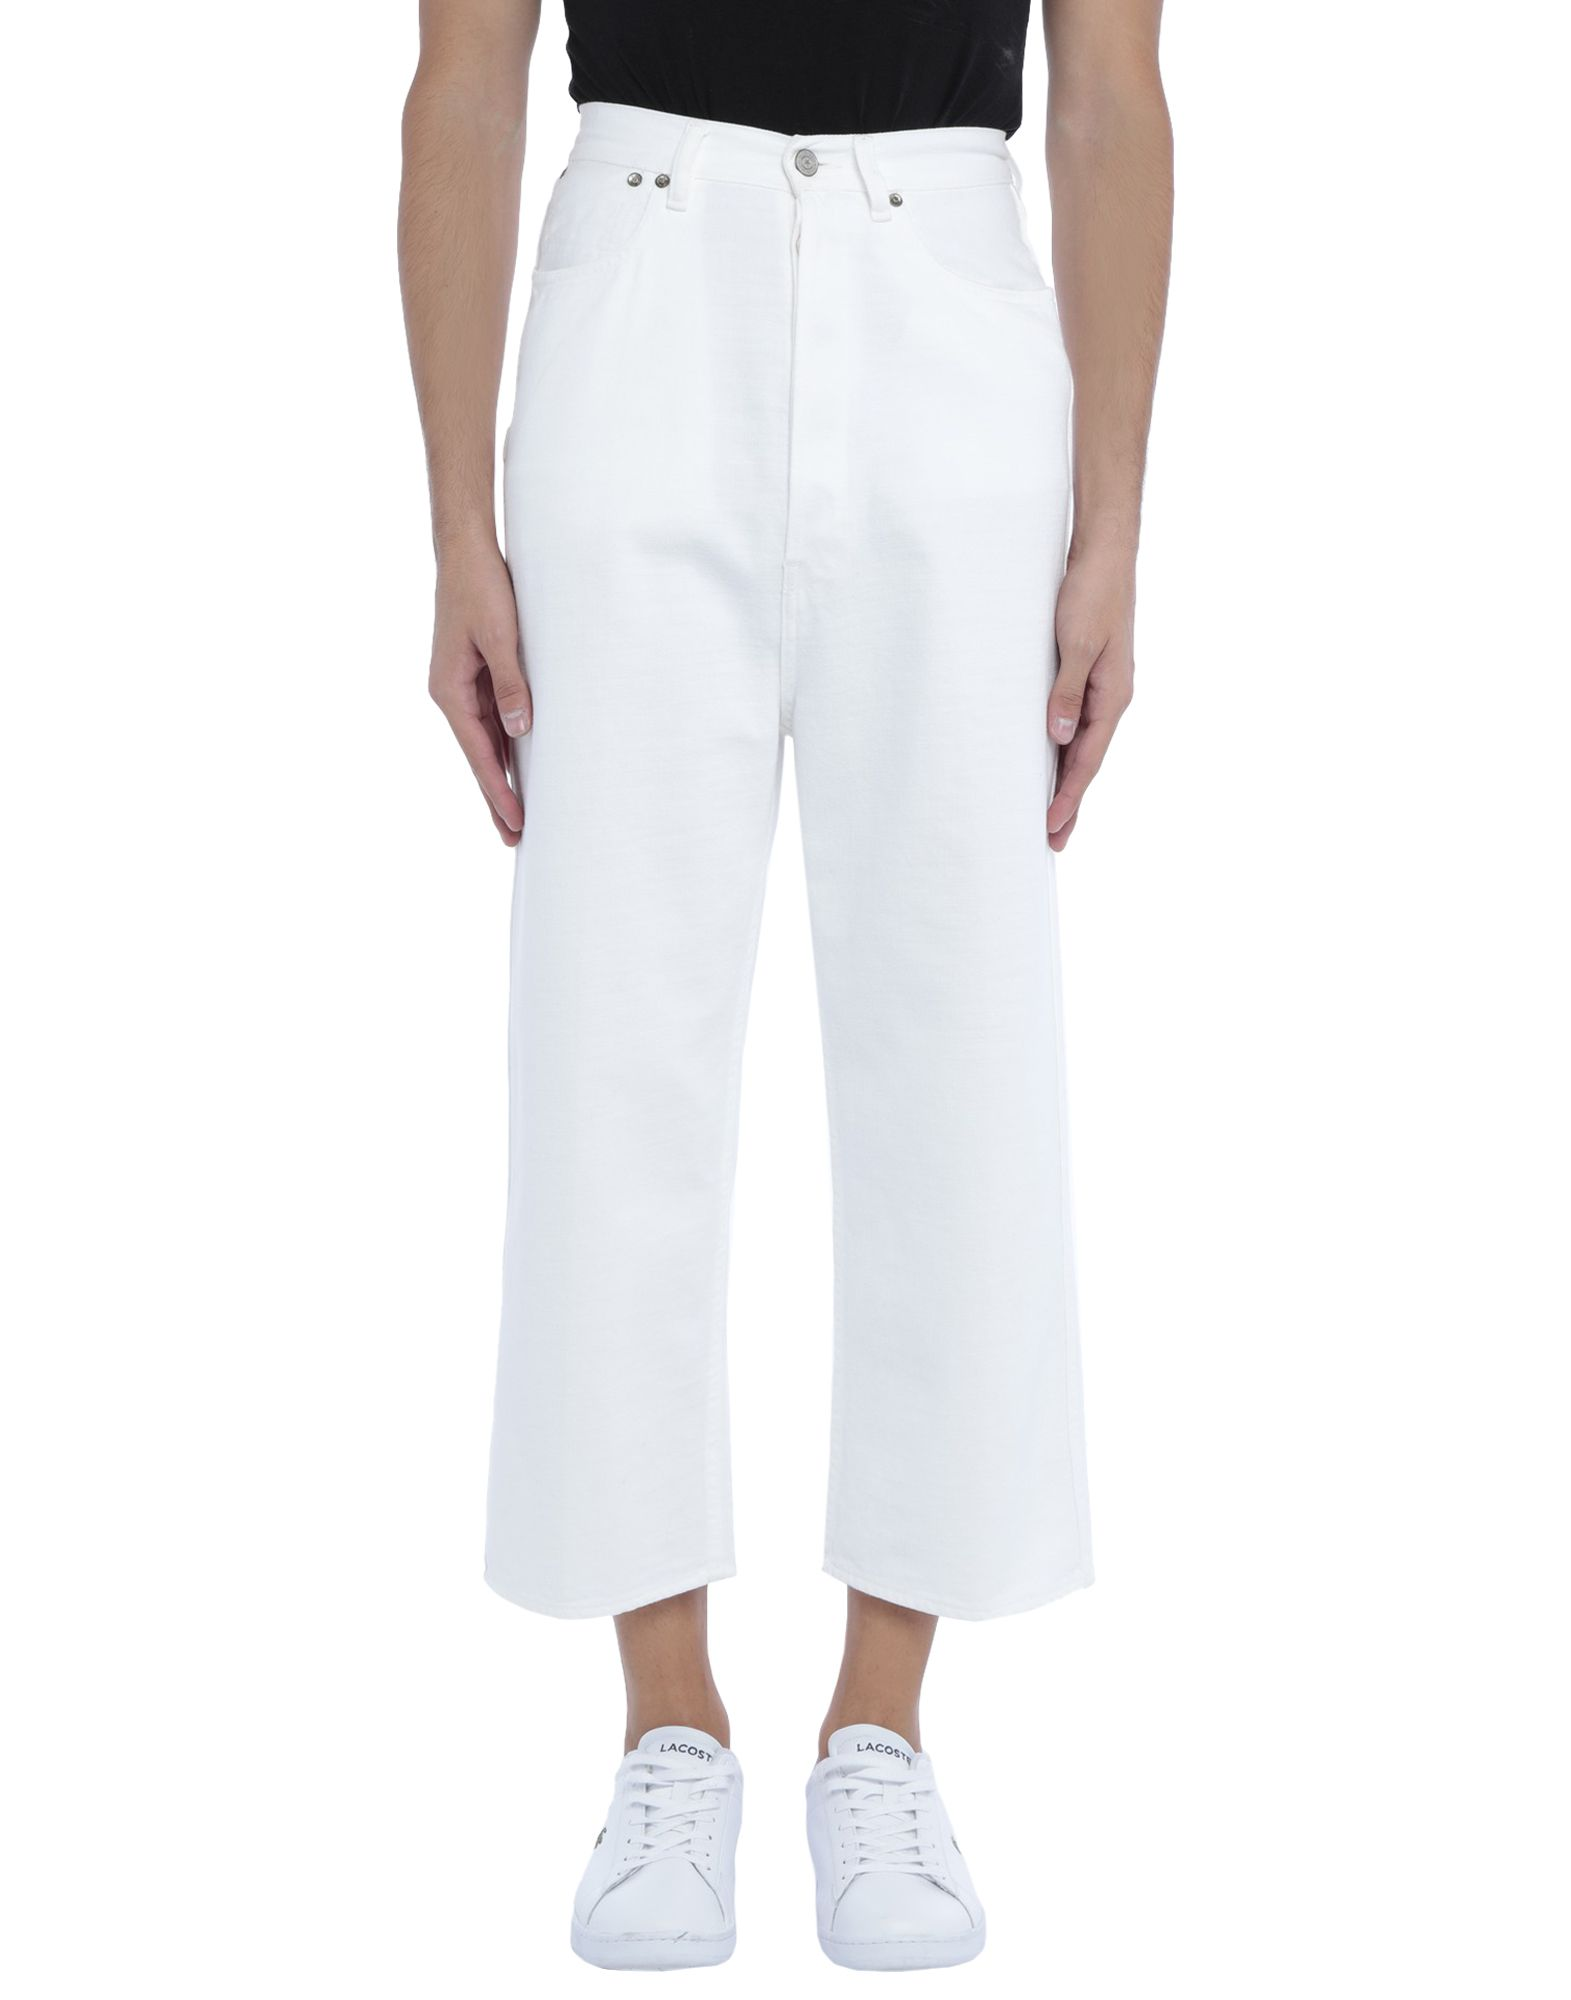 GOLDEN GOOSE DELUXE BRAND Повседневные брюки цена 2017